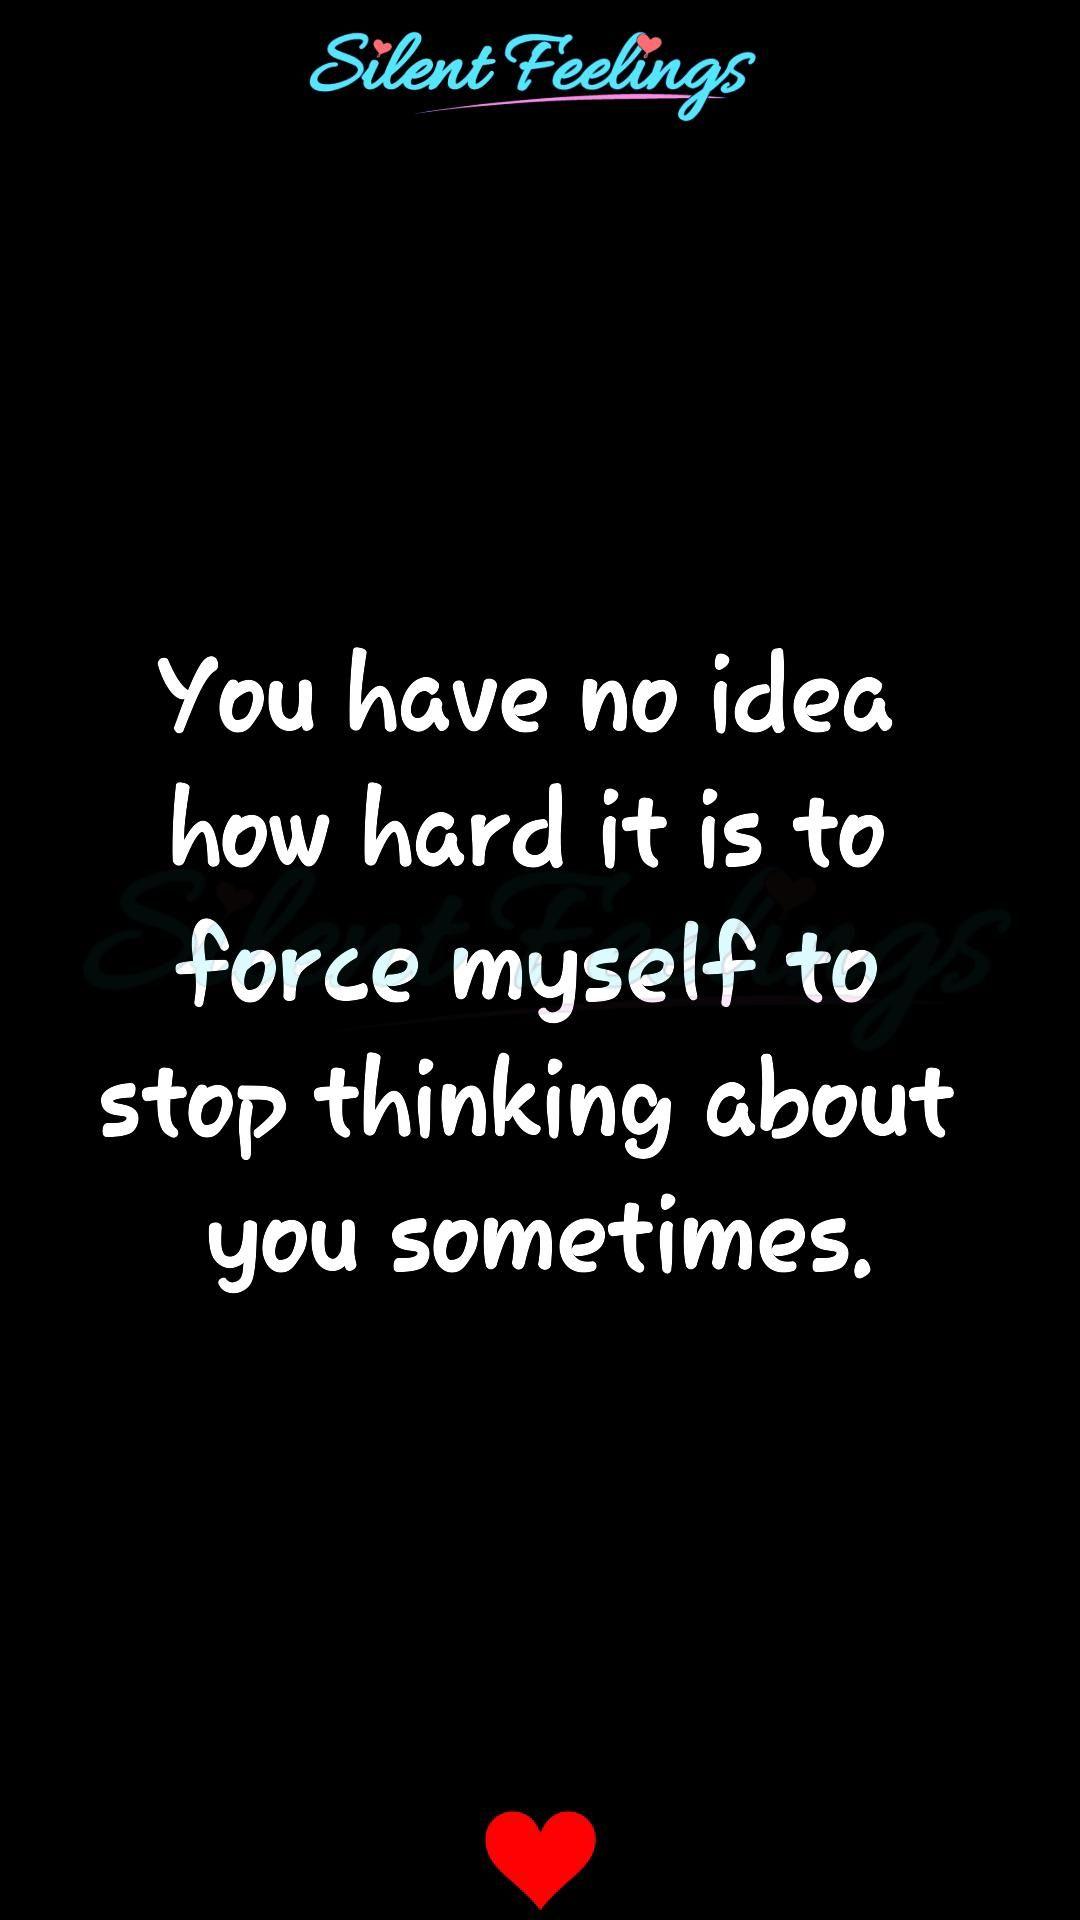 You have no idea how